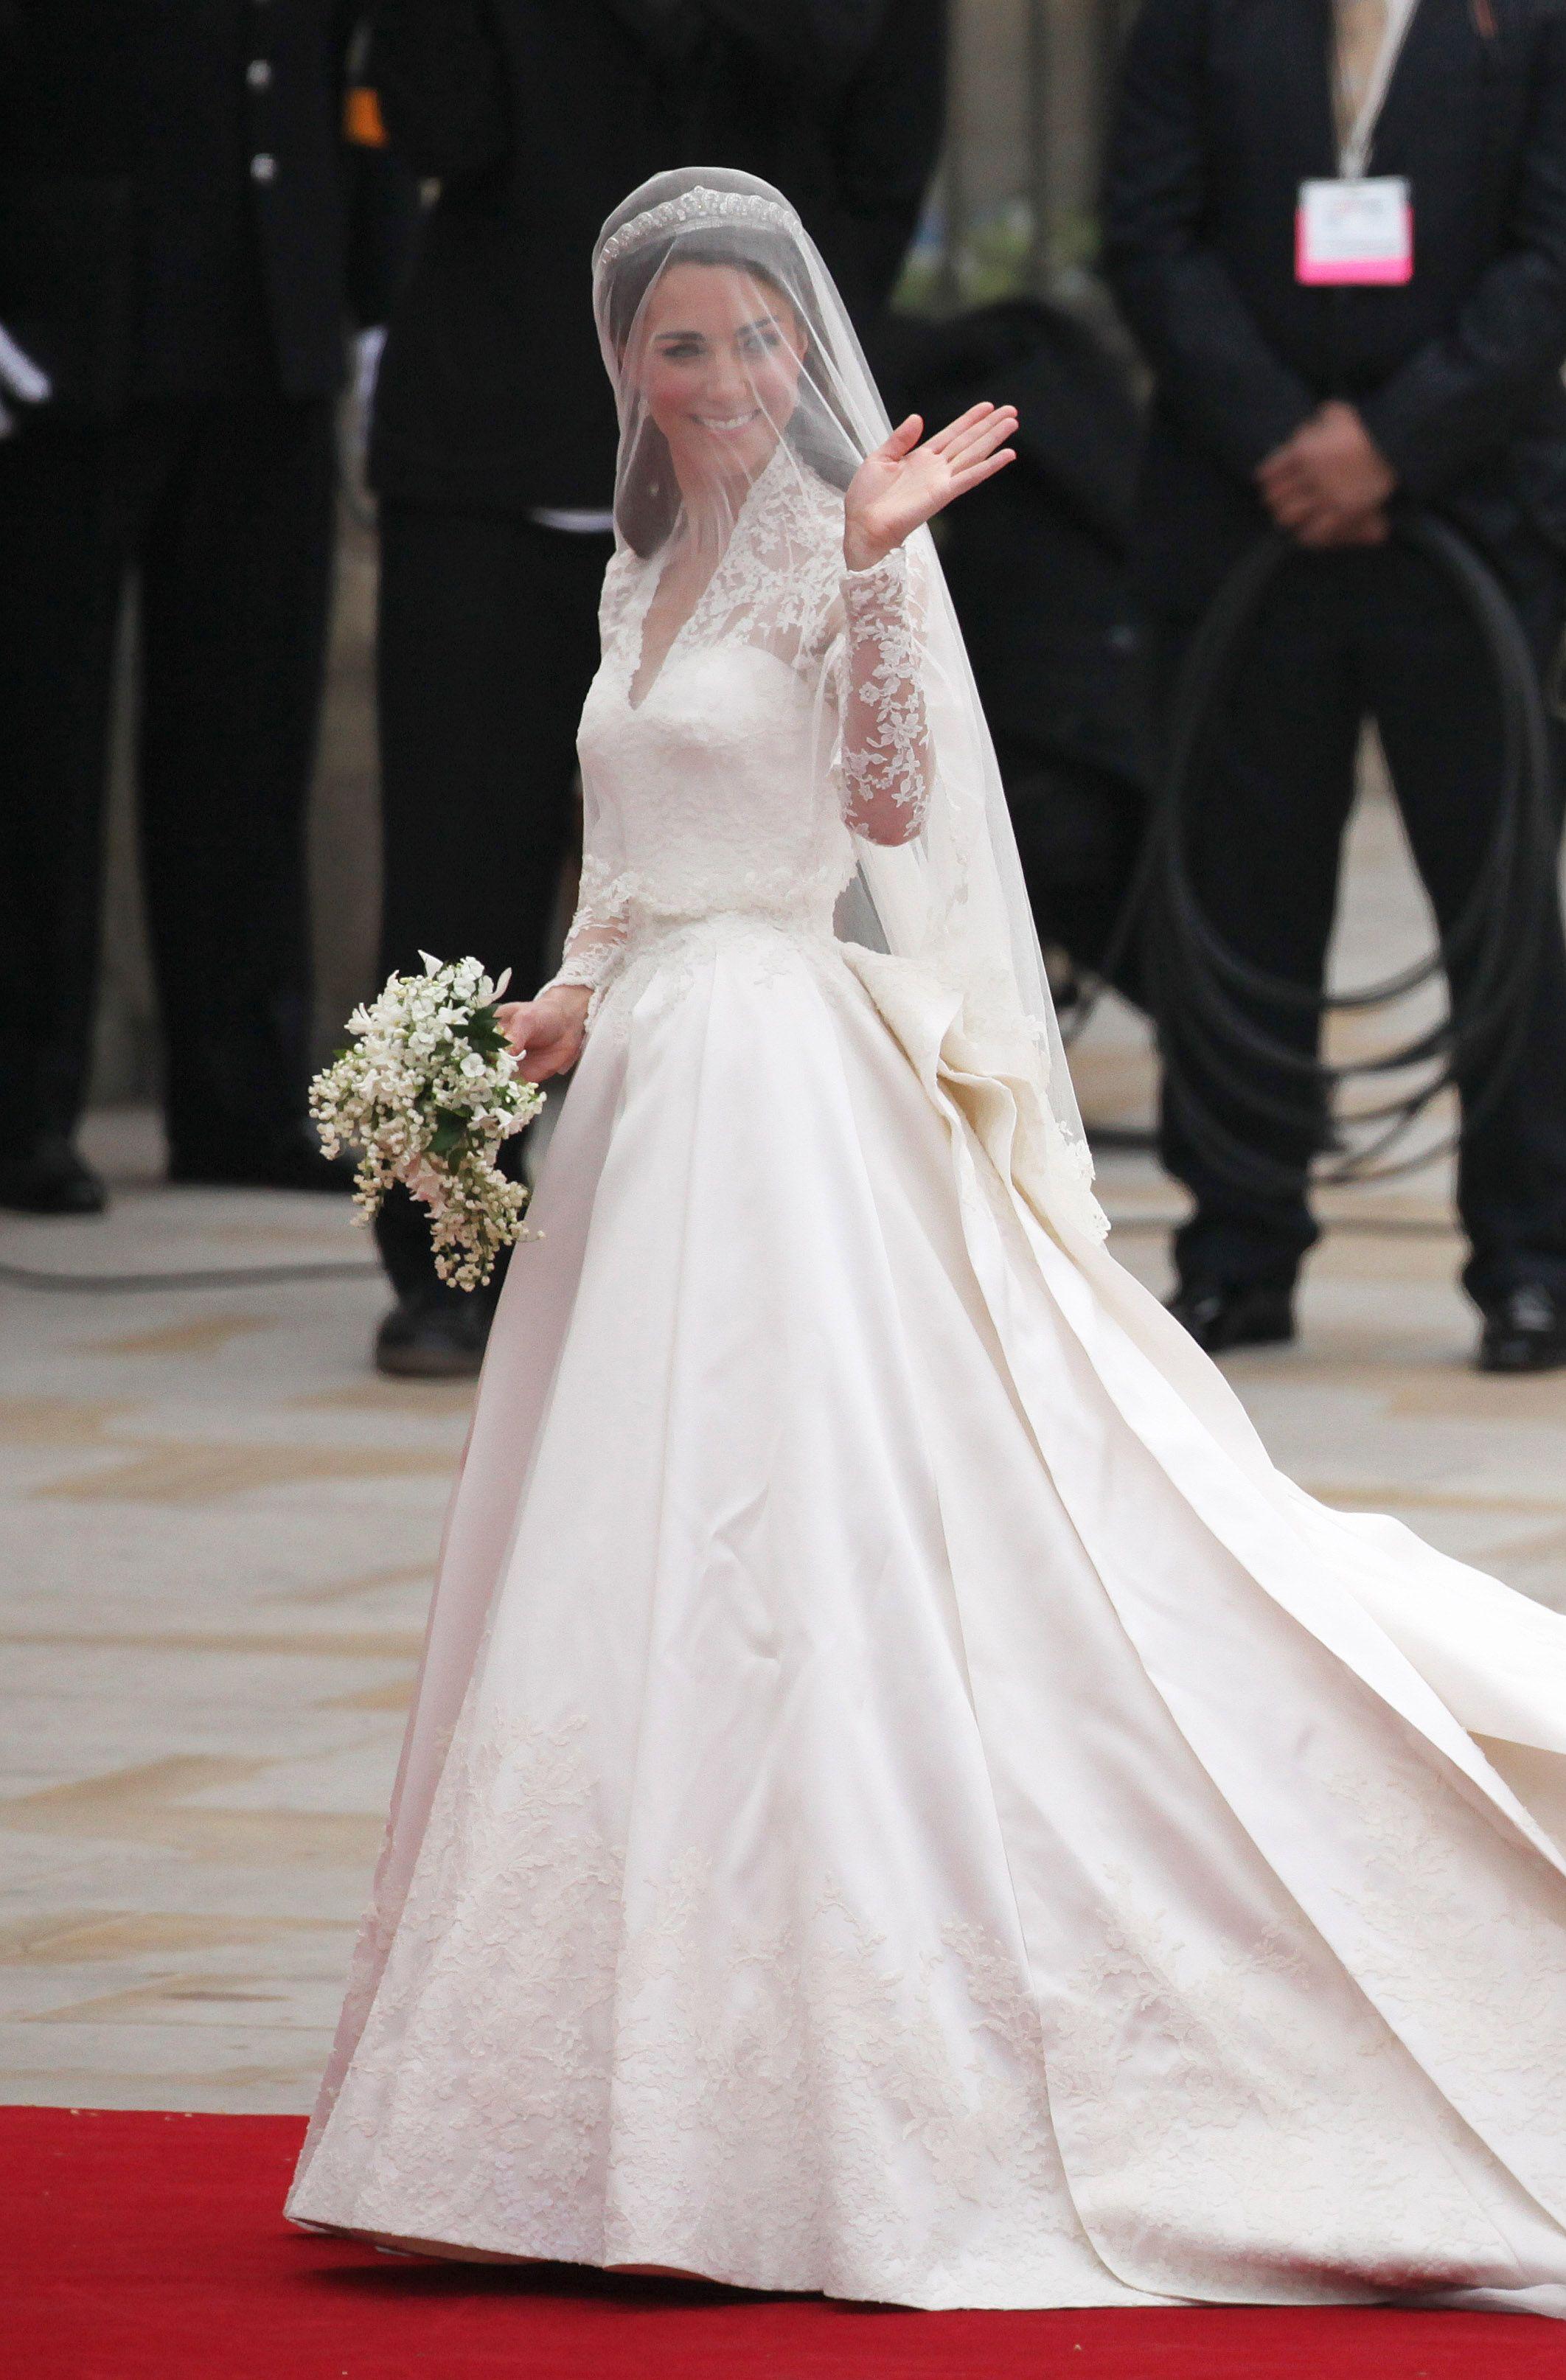 Meghan Markles Royal Wedding Dress Compared To Kate Middletons